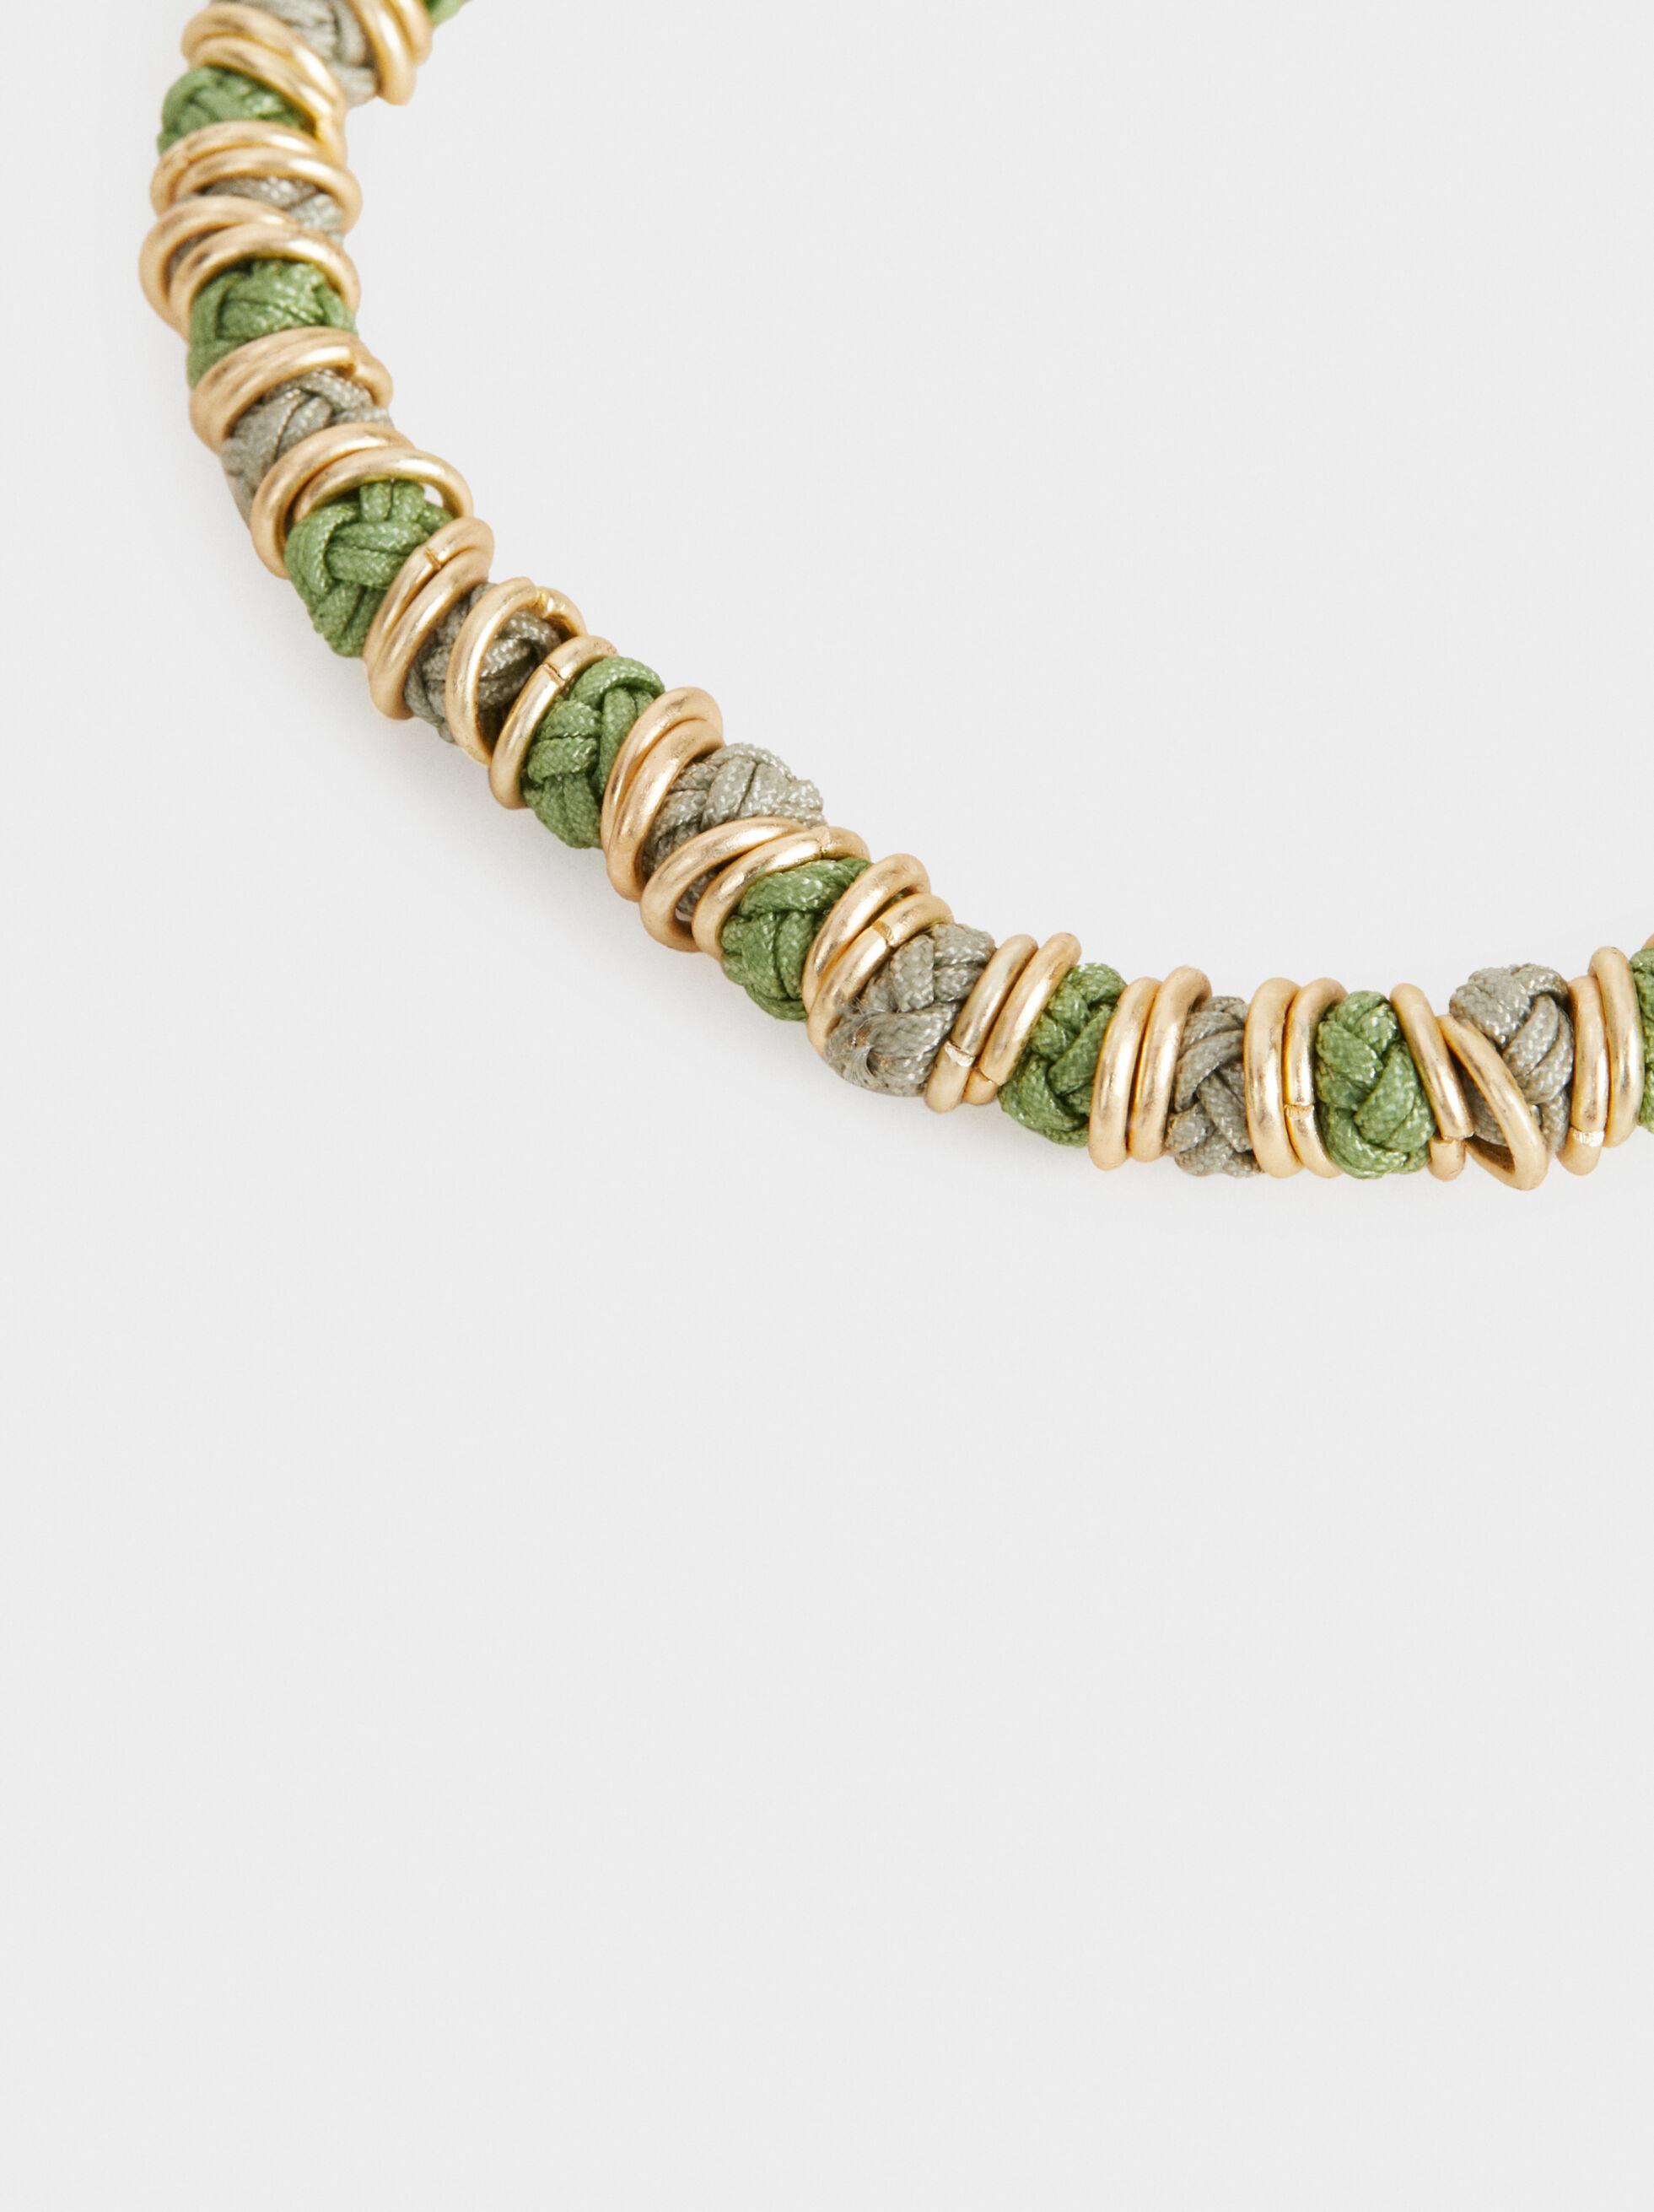 Stone Story Adjustable Bracelet With Metal Appliqu, Multicolor, hi-res